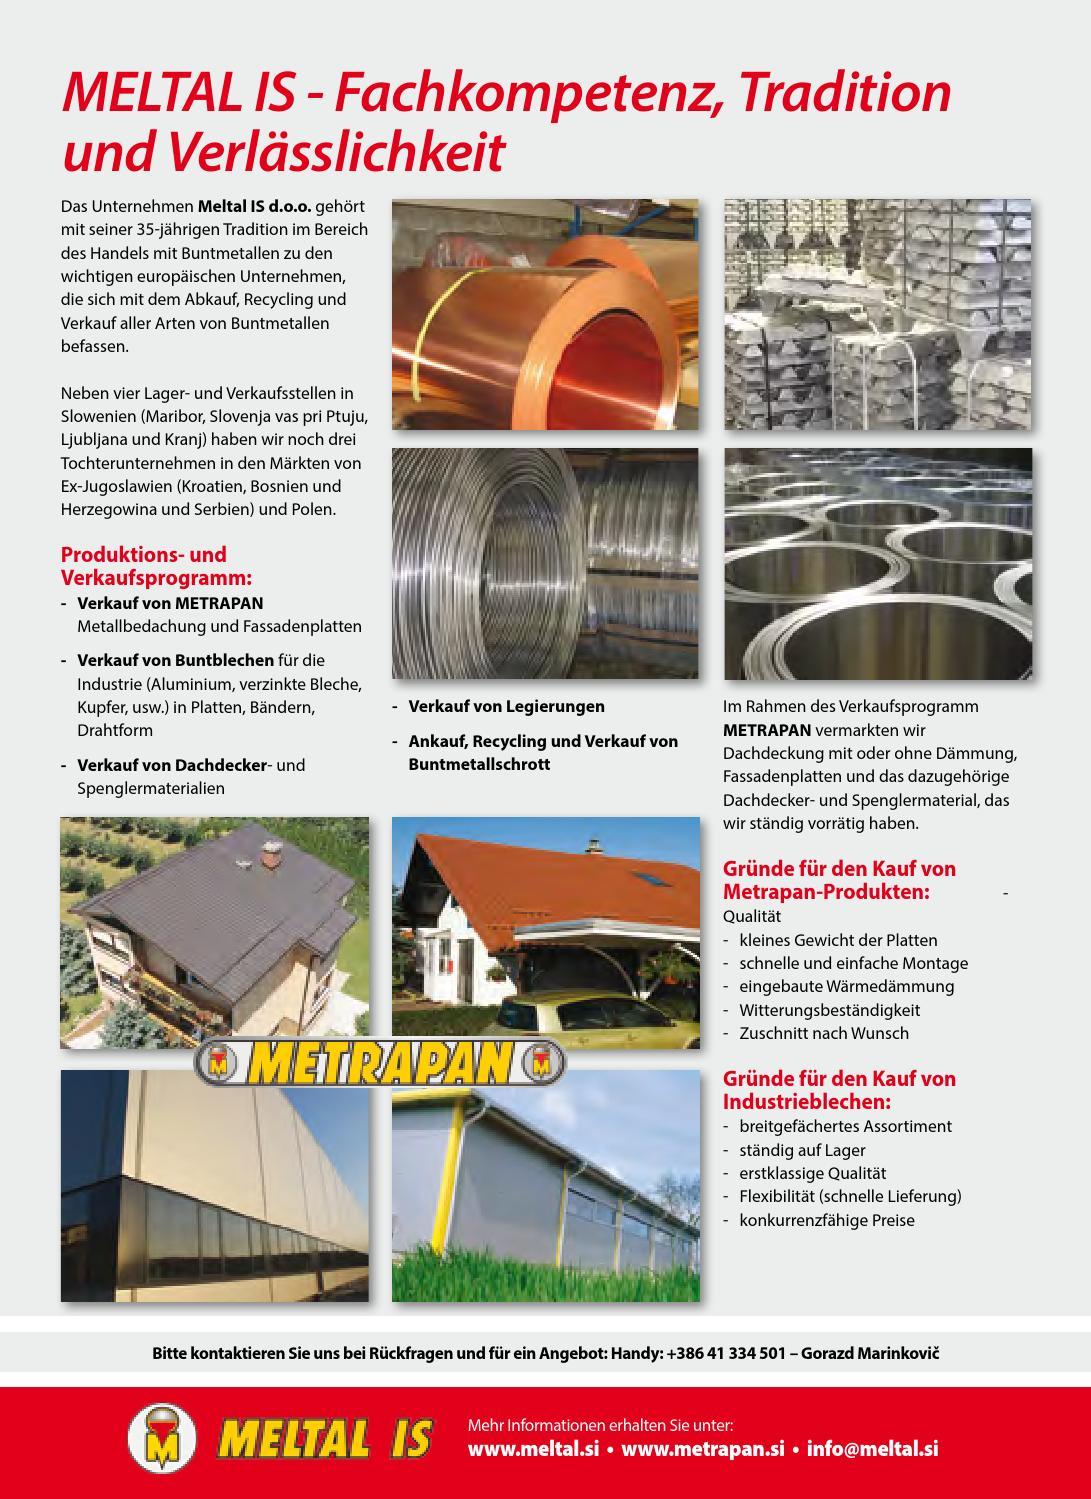 Groß Aluminium Drahtform Bilder - Elektrische Schaltplan-Ideen ...